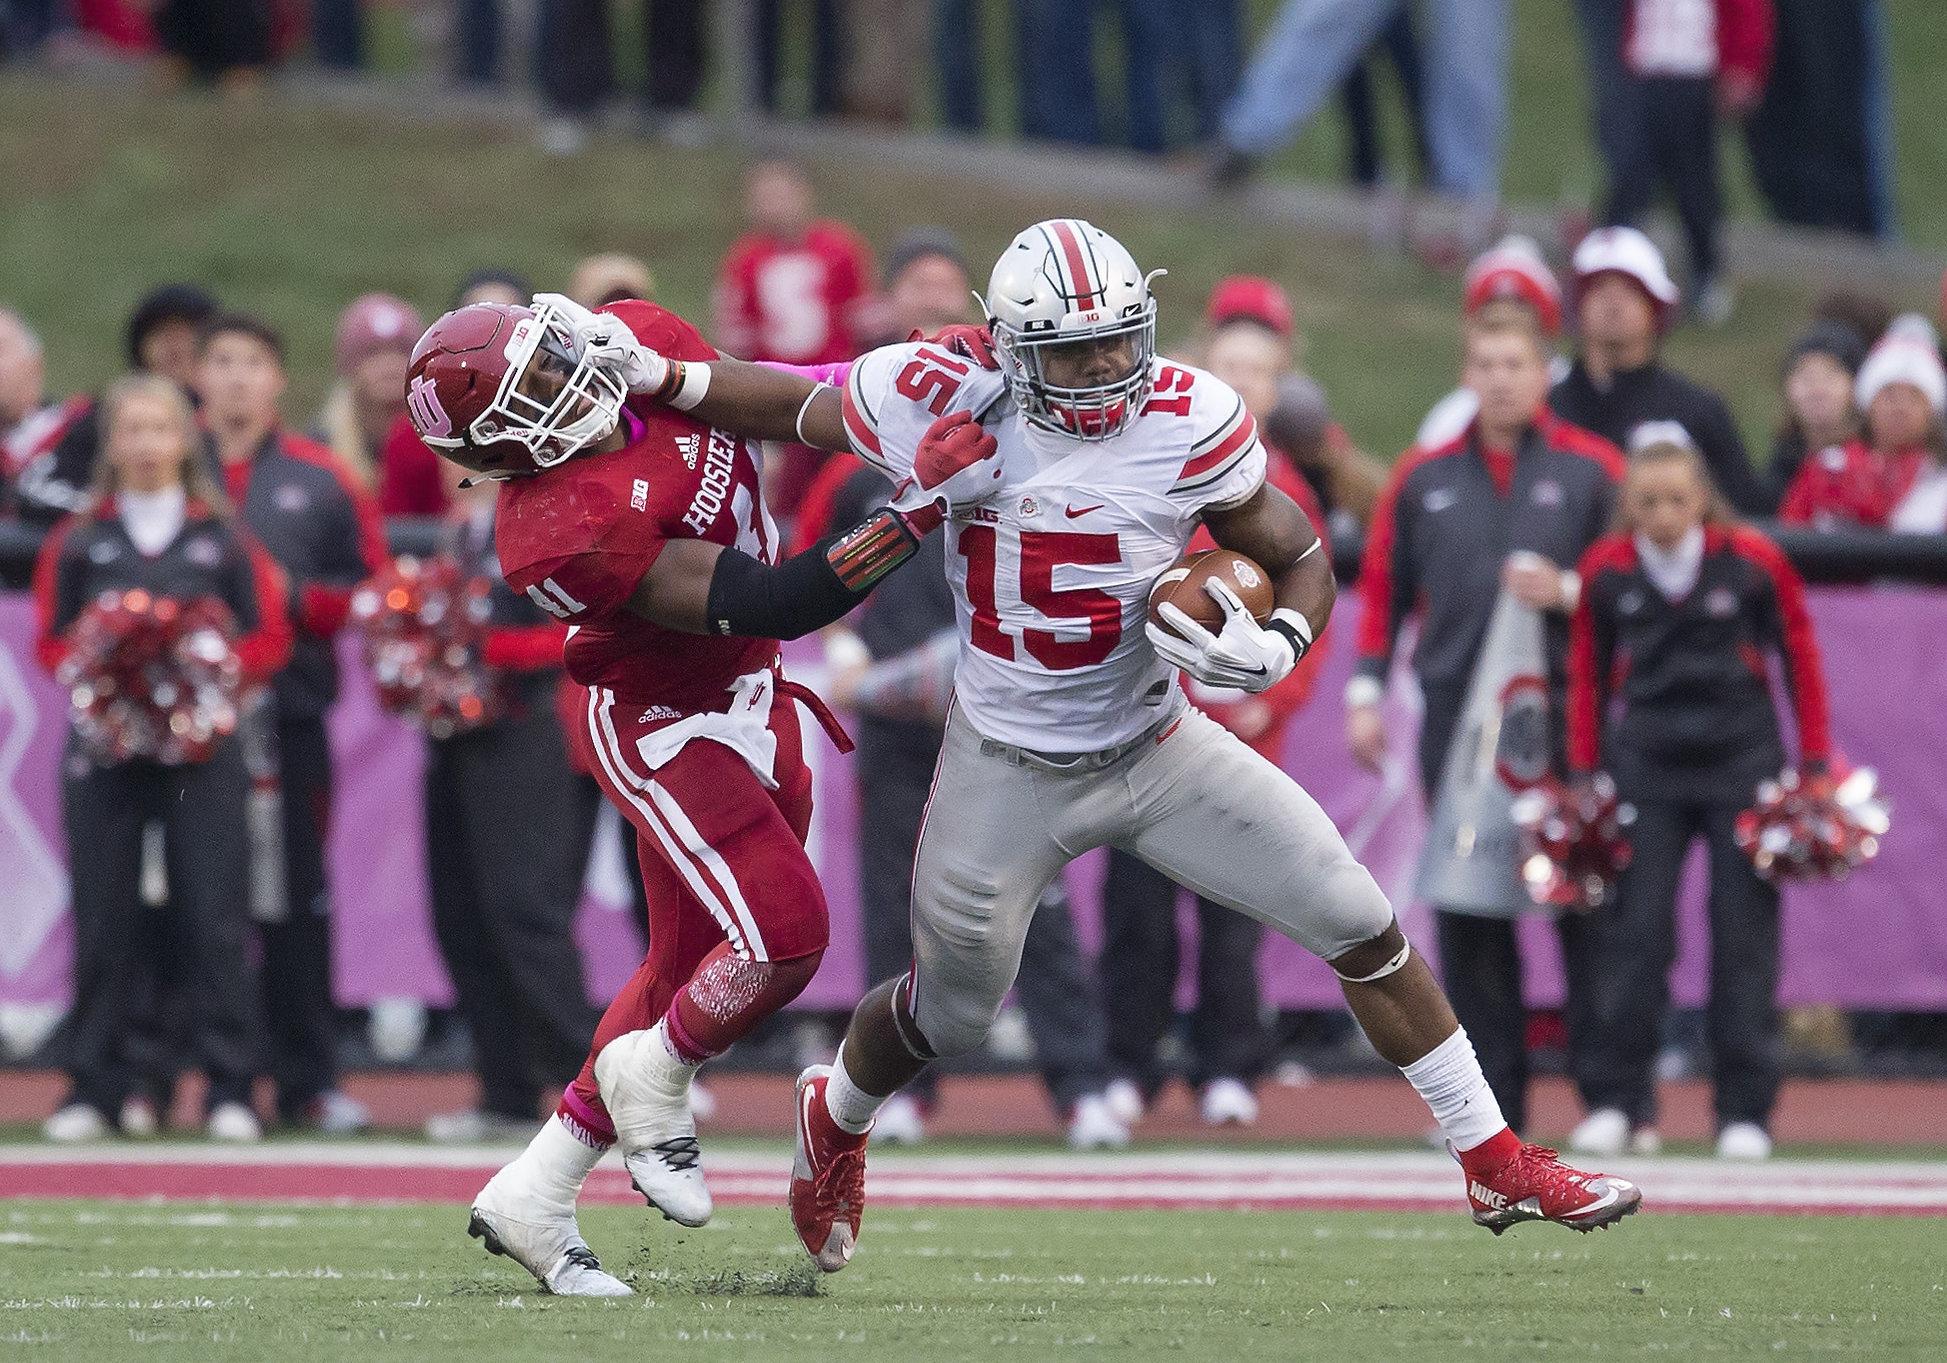 NCAA FOOTBALL: OCT 03 Ohio State at Indiana